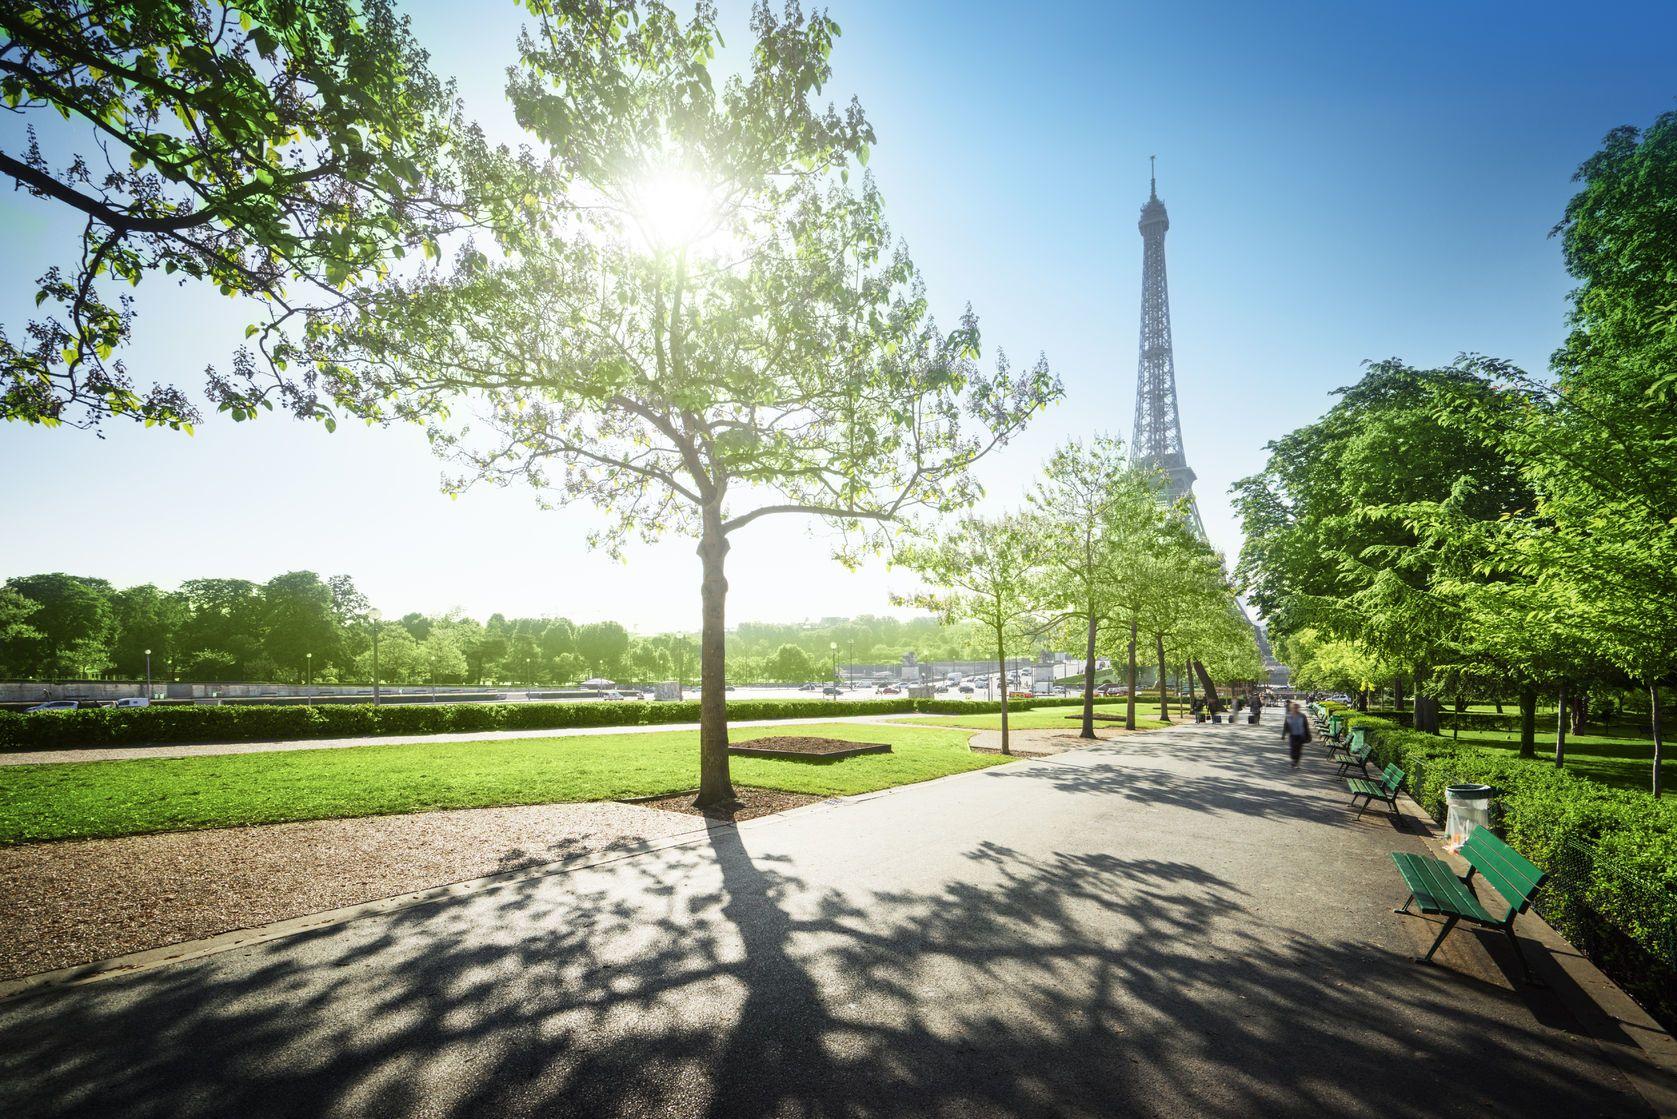 Slunečné ráno v pařížském parku | iakov/123RF.com